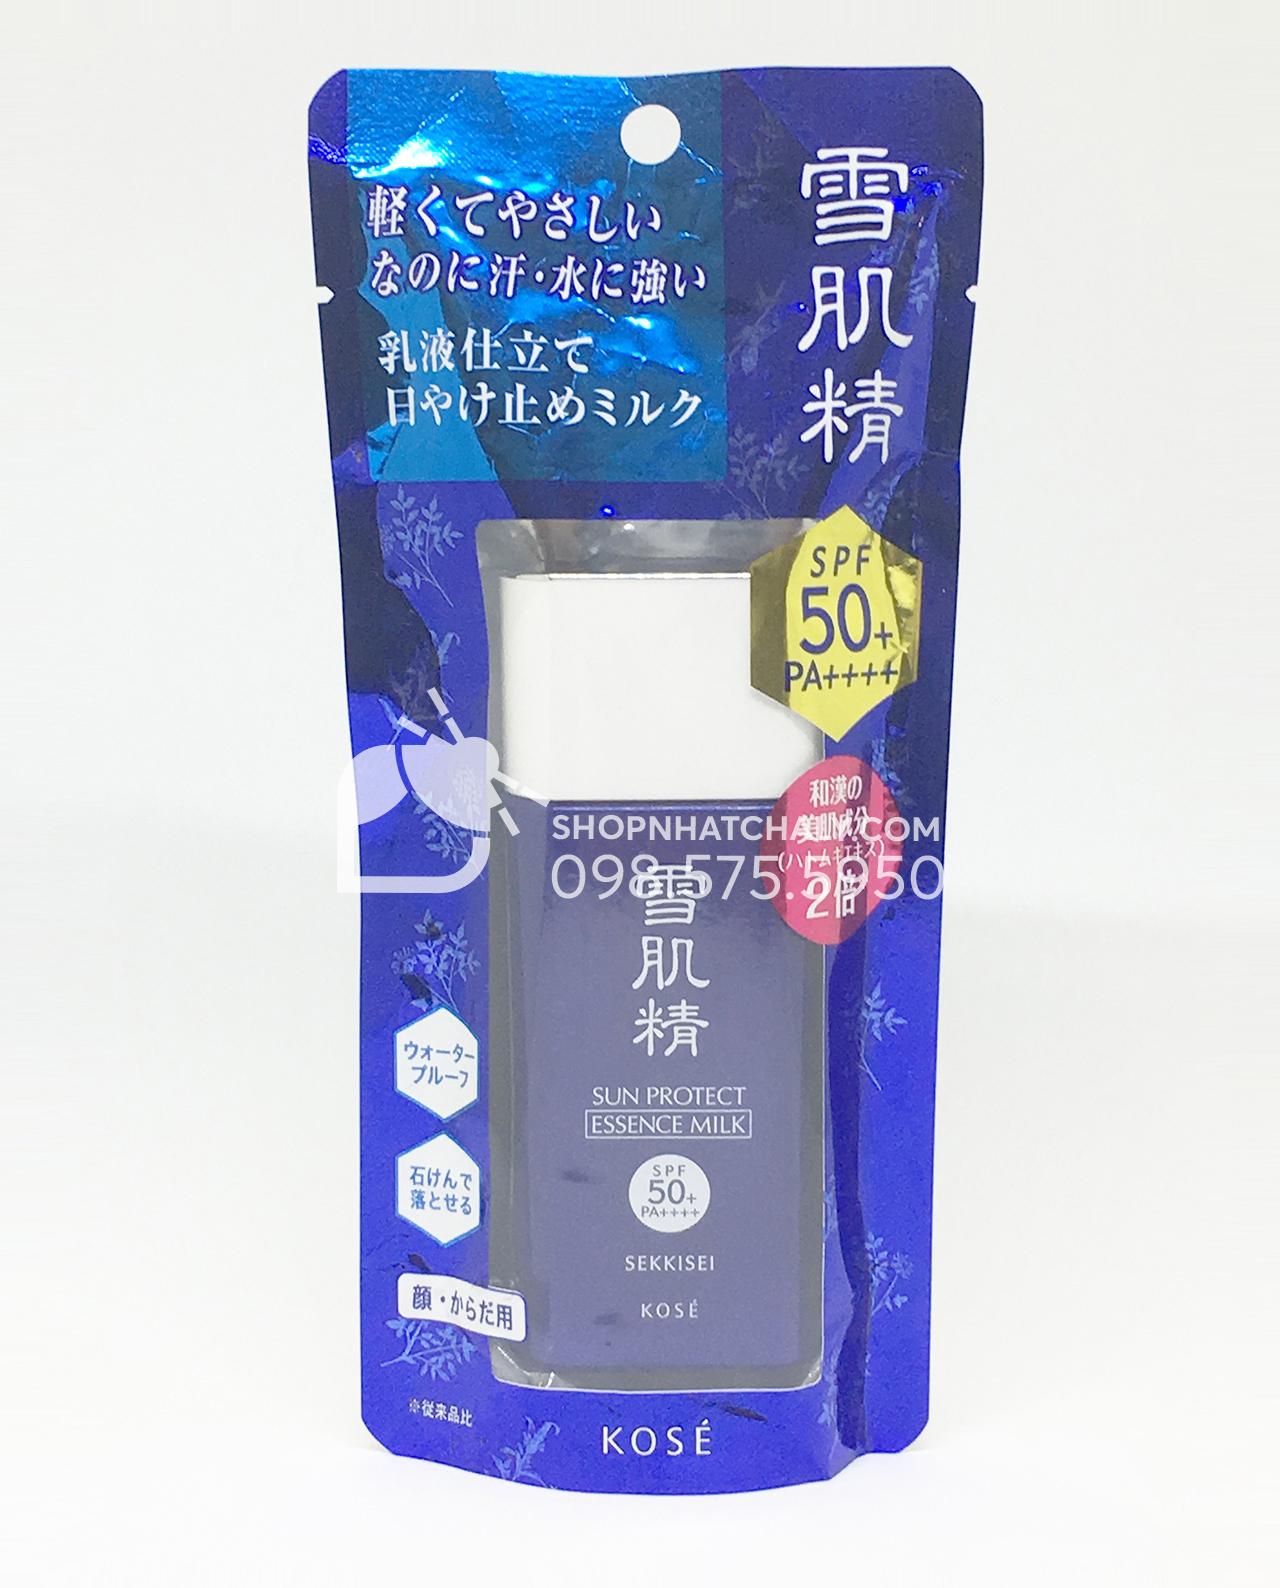 Kem chống nắng dưỡng da Kose dạng milk Sekkisei Sun Protect Essence Milk SPF 50 60gr